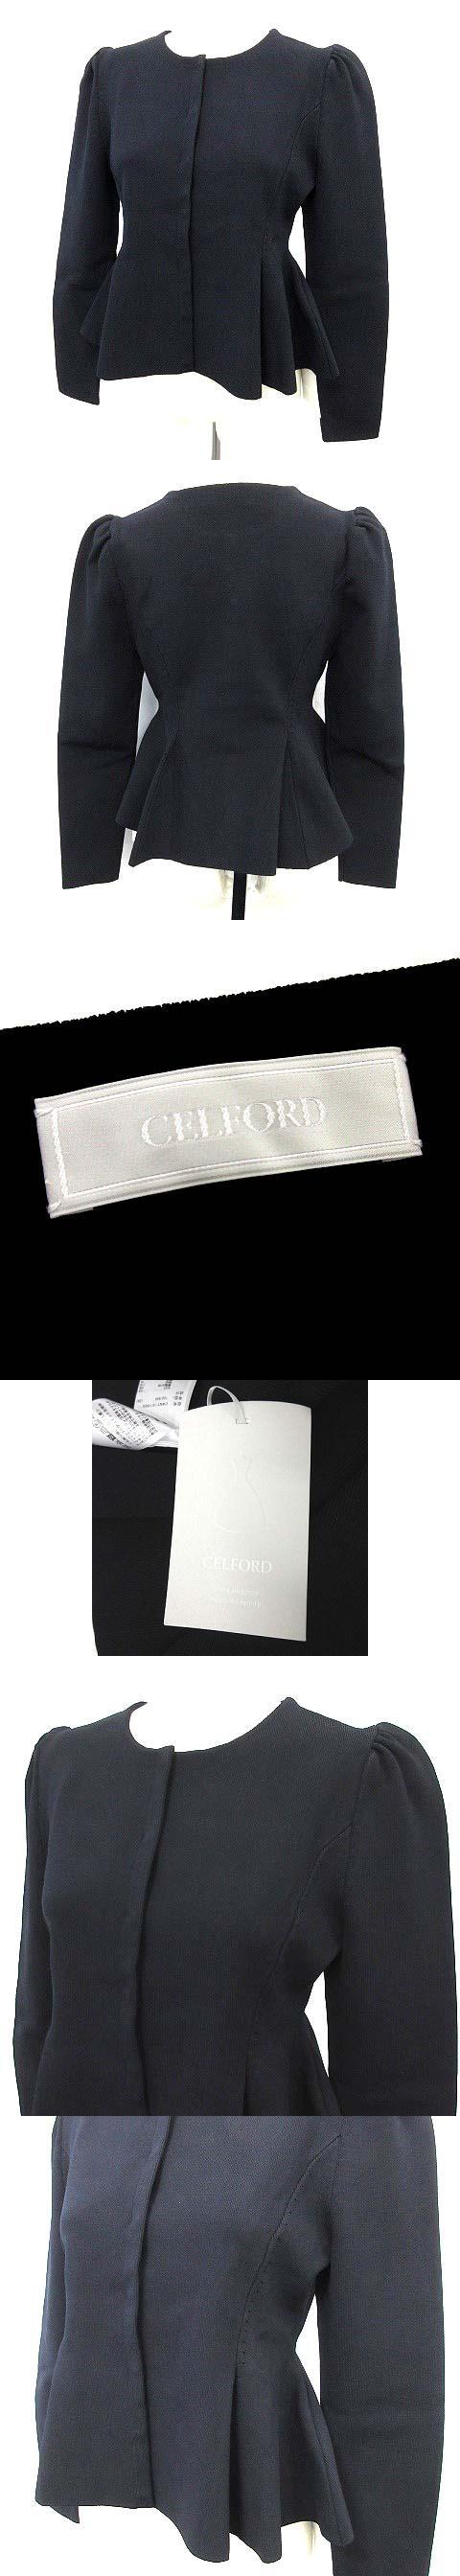 "\""CELFORD"